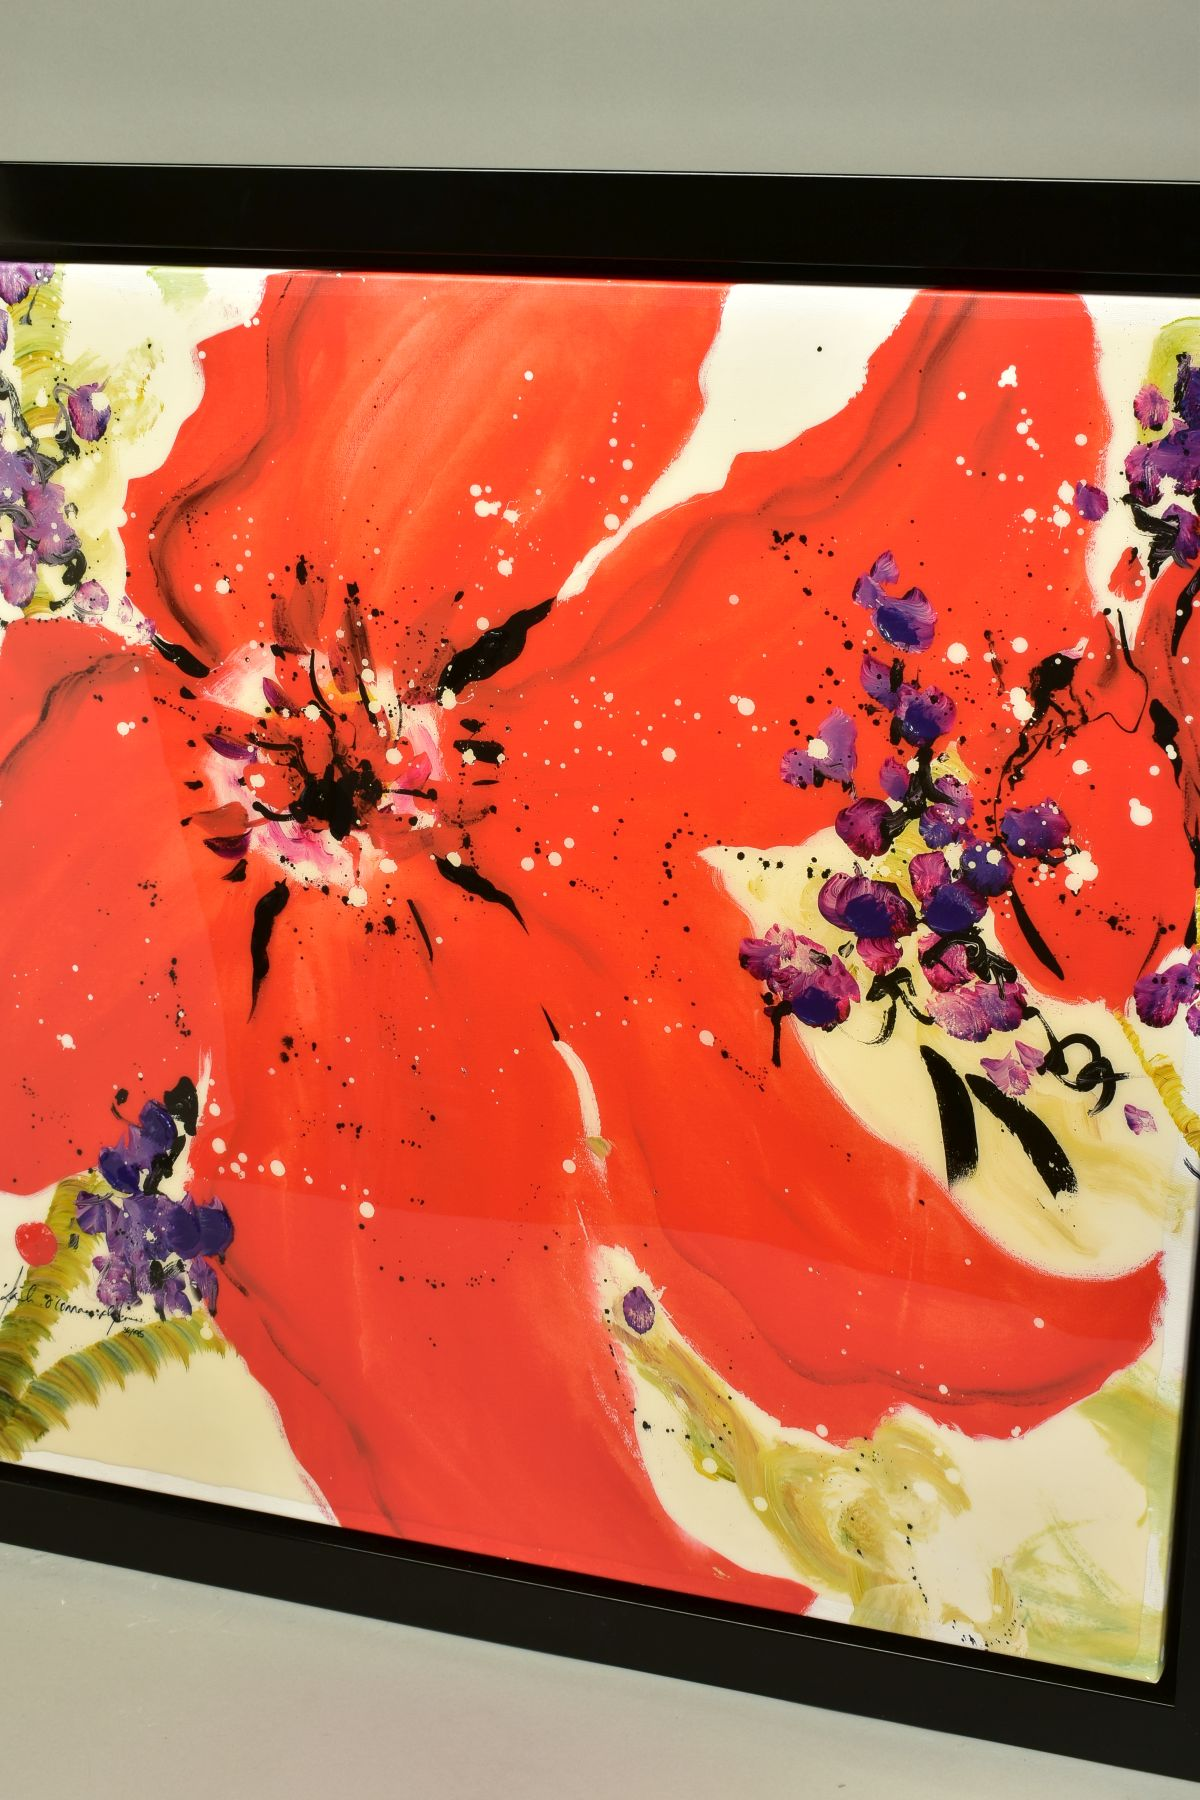 DANIELLE O'CONNOR AKIYAMA (CANADA 1957), 'Journey I', a Limited Edition print of blossom, 36/195, - Image 4 of 5